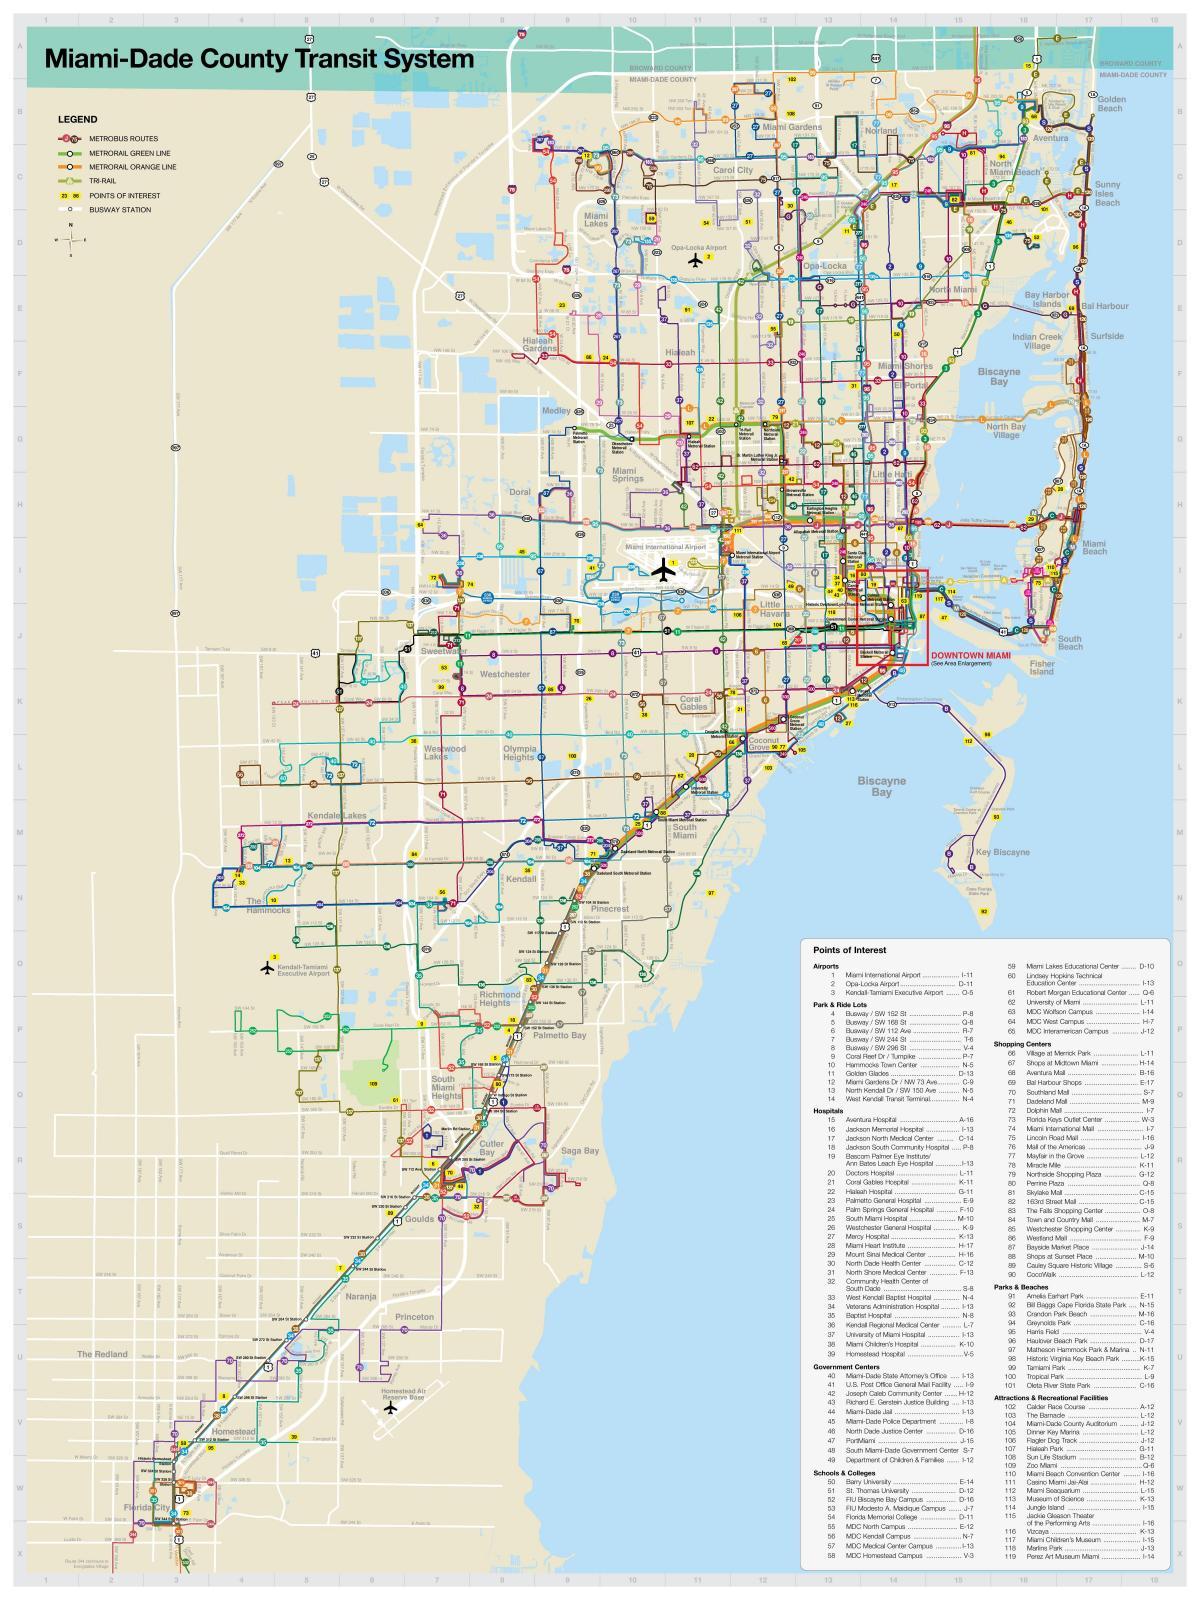 miami mapa de transporte - miami mapa de transporte